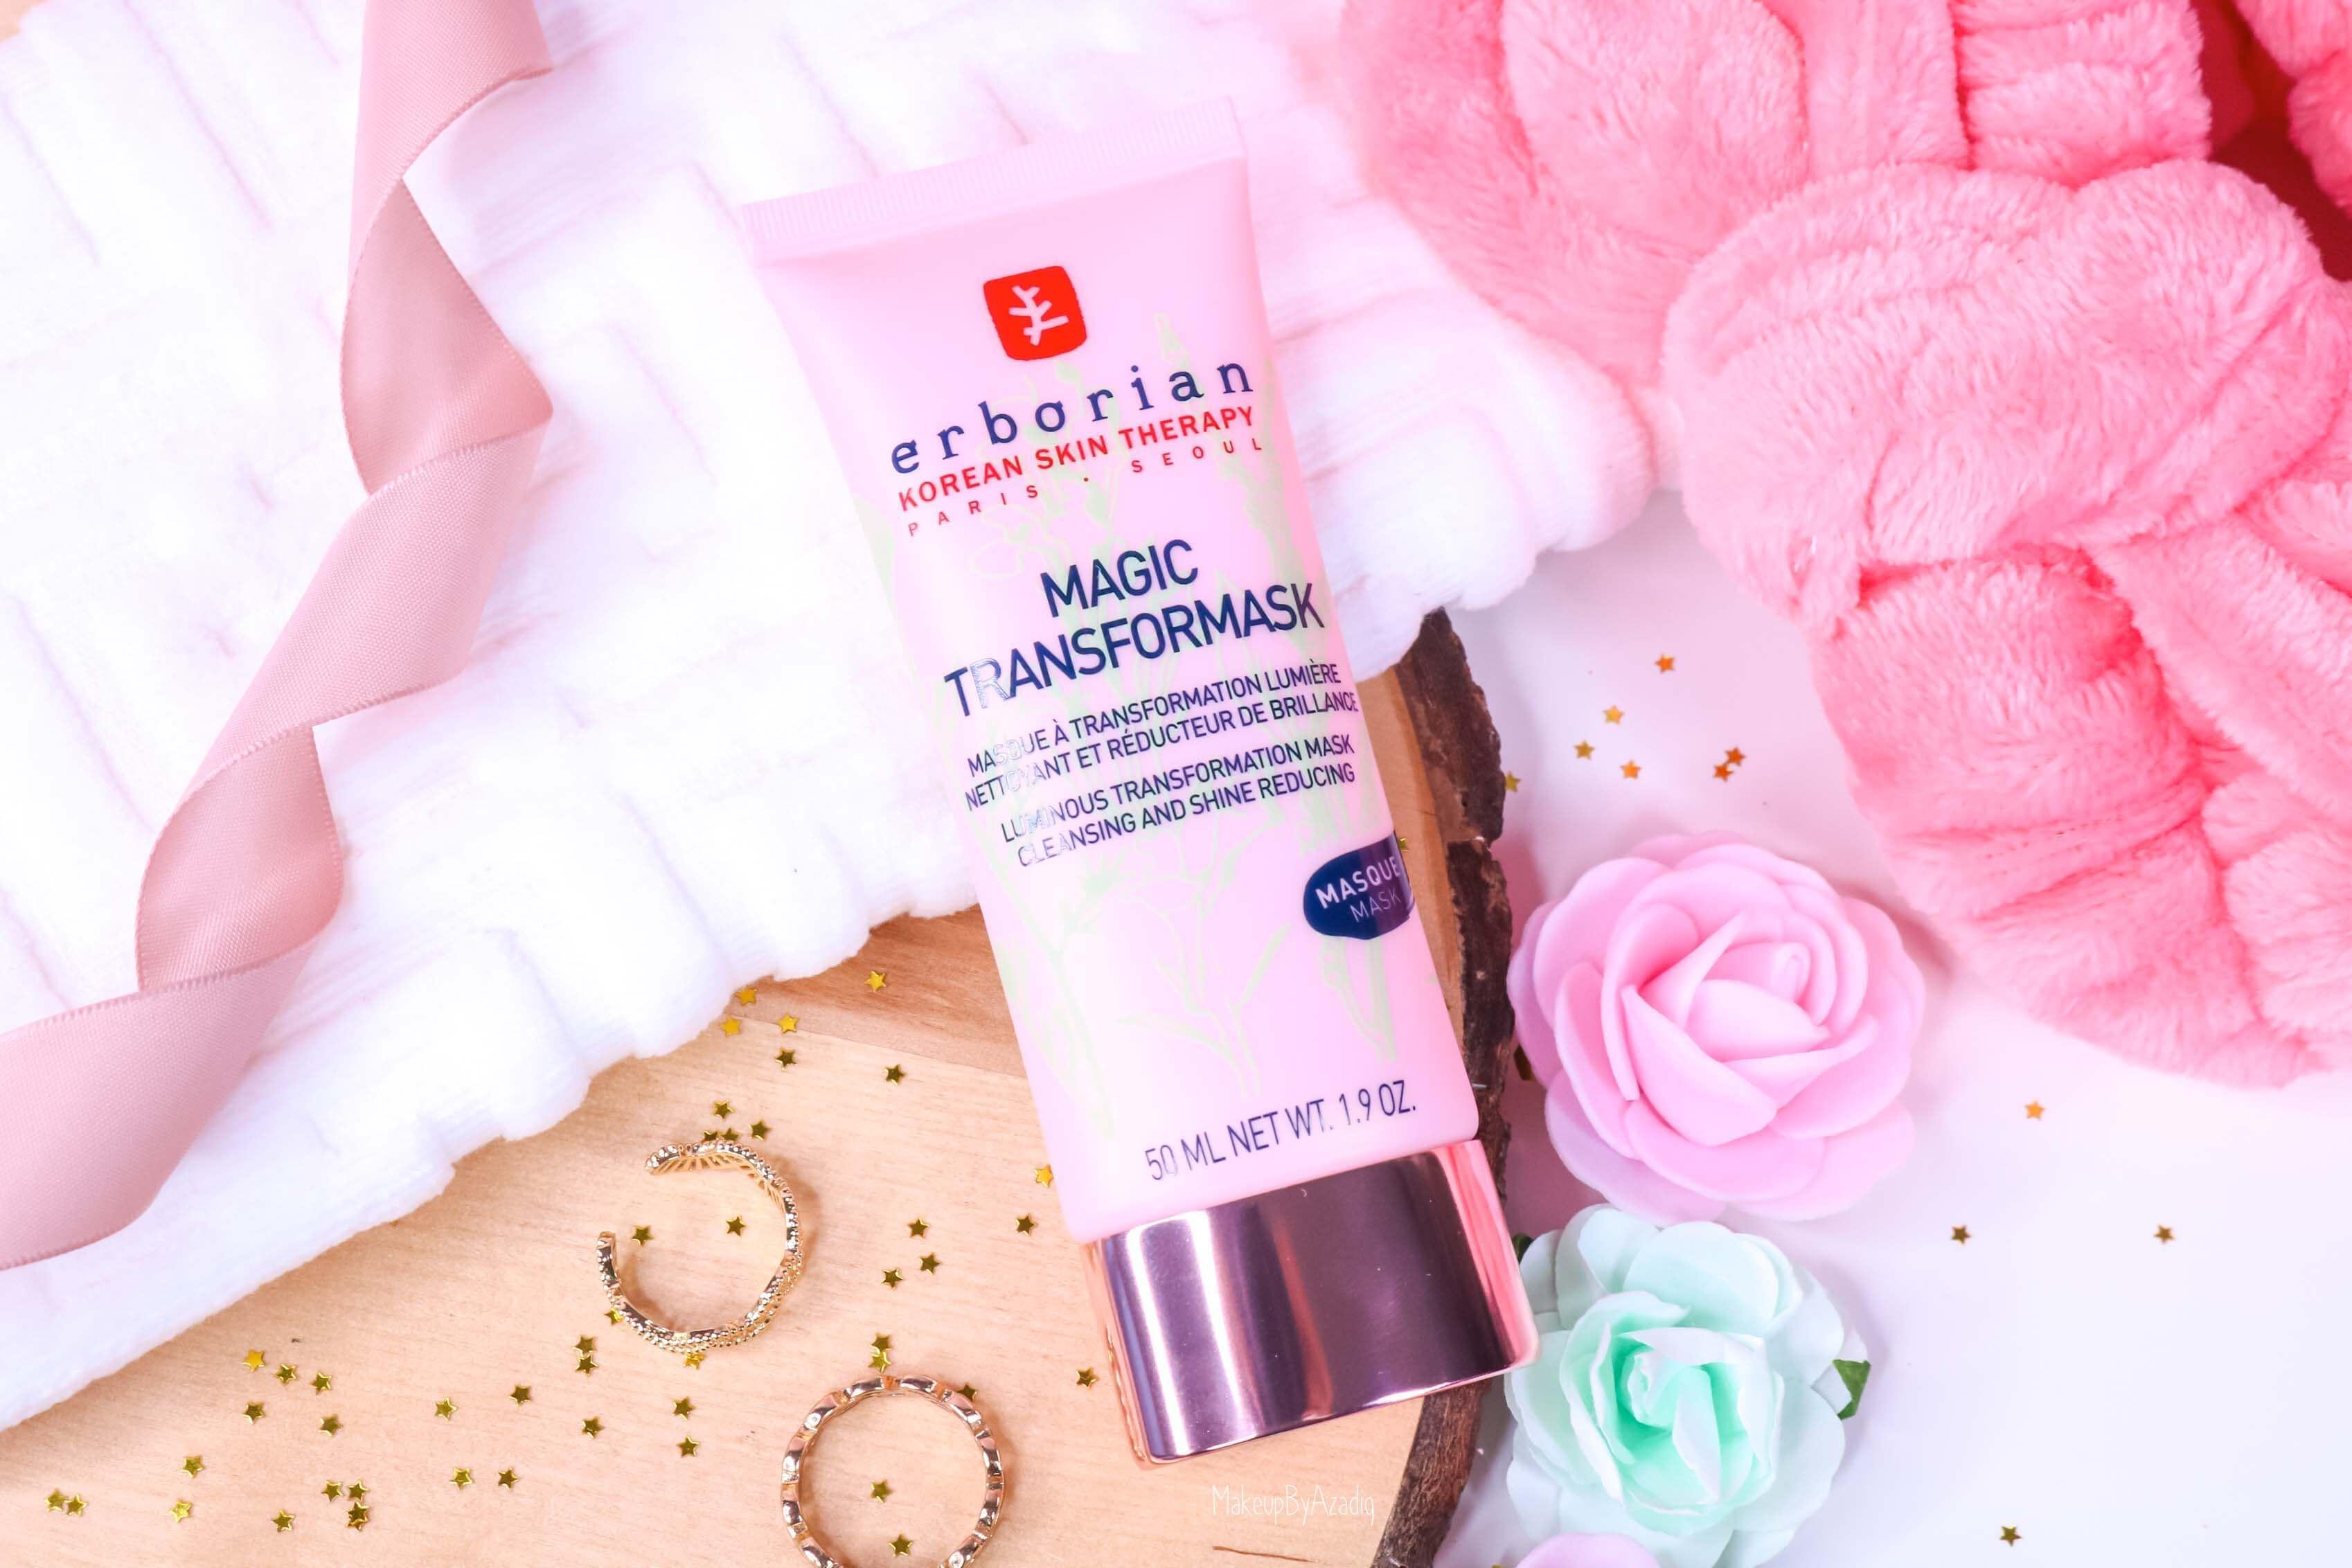 revue-magic-transformask-erborian-masque-visage-rose-sephora-avis-prix-makeupbyazadig-korean-skin